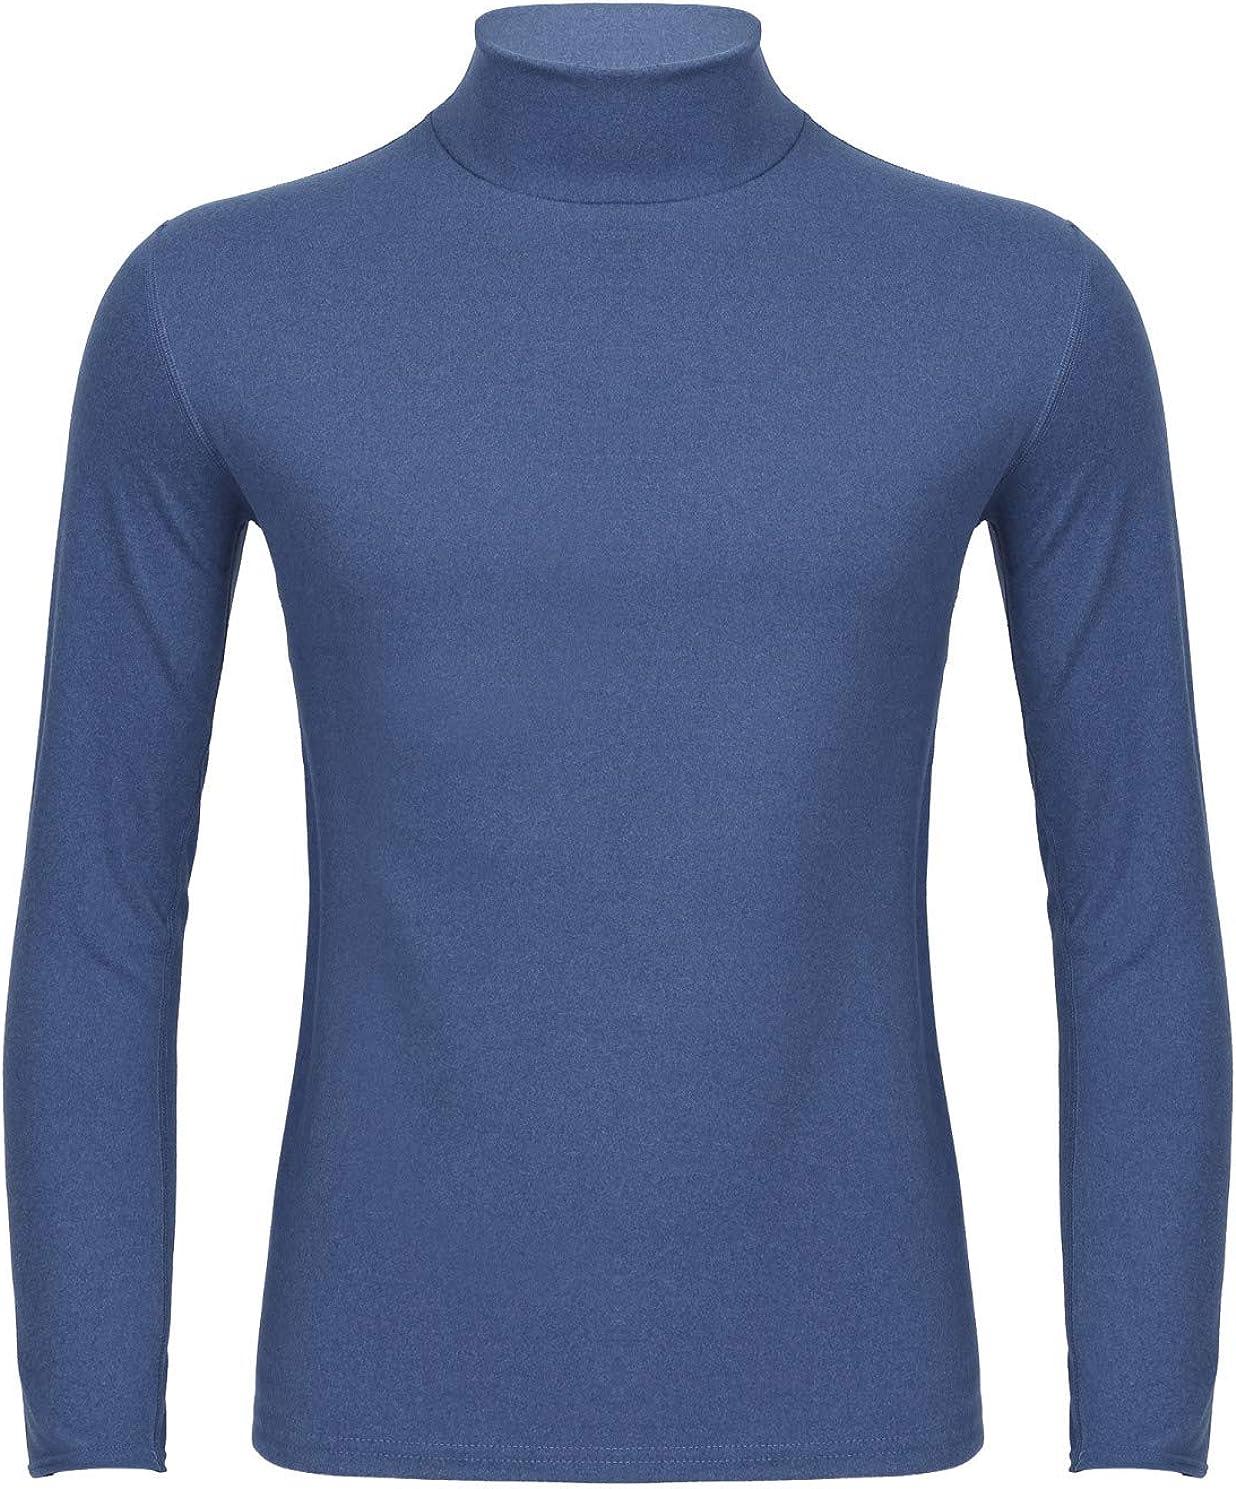 iiniim Thermals for Men Cold Weather Long Sleeve Turtle Mock Neck Undershirt Base Layer Shirts